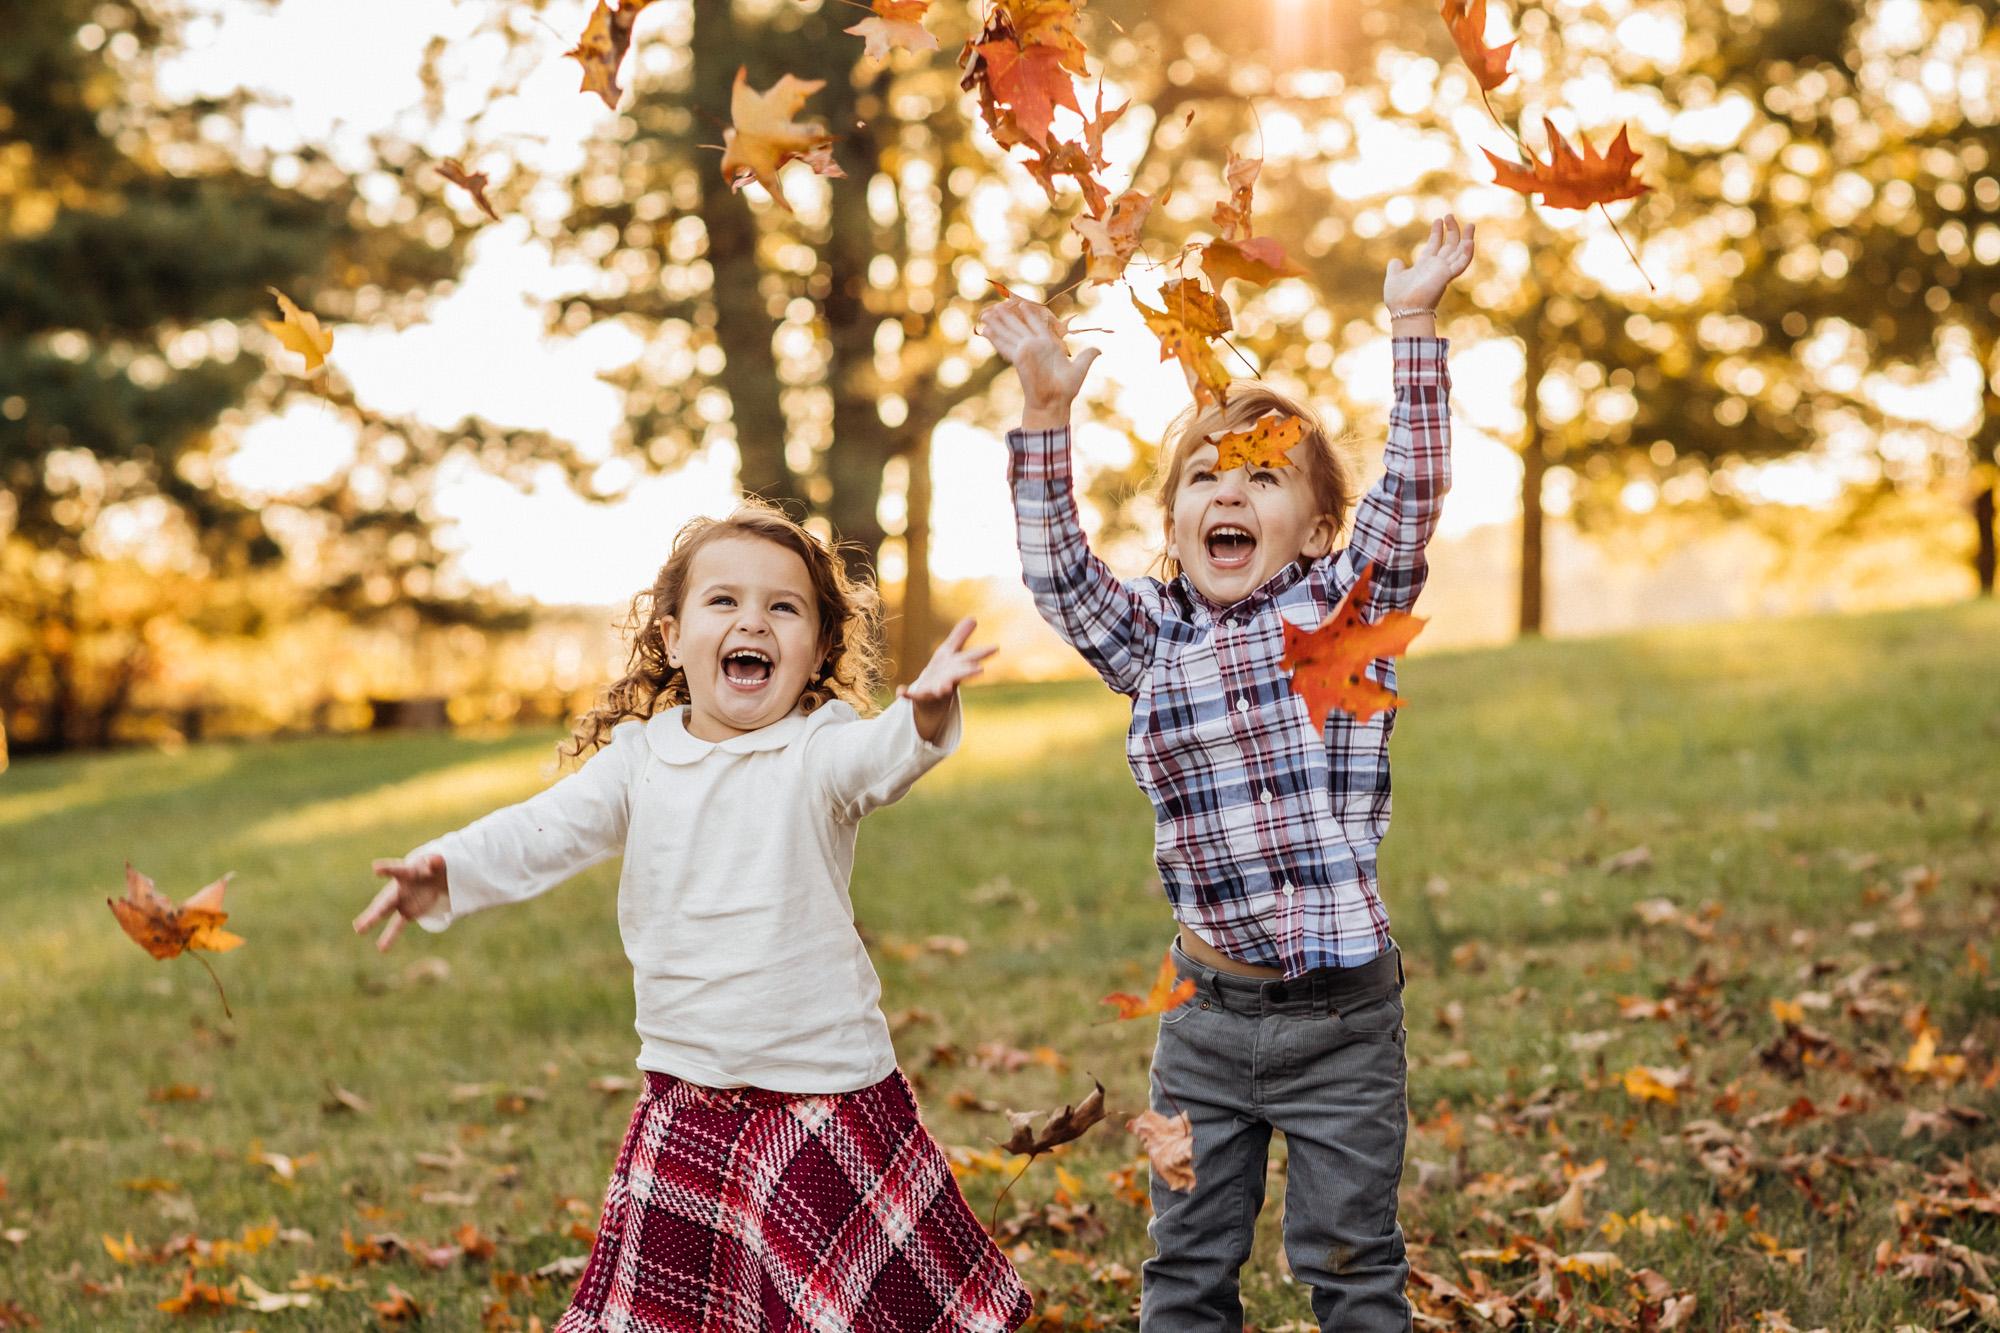 Kids Throwing leaves in the air